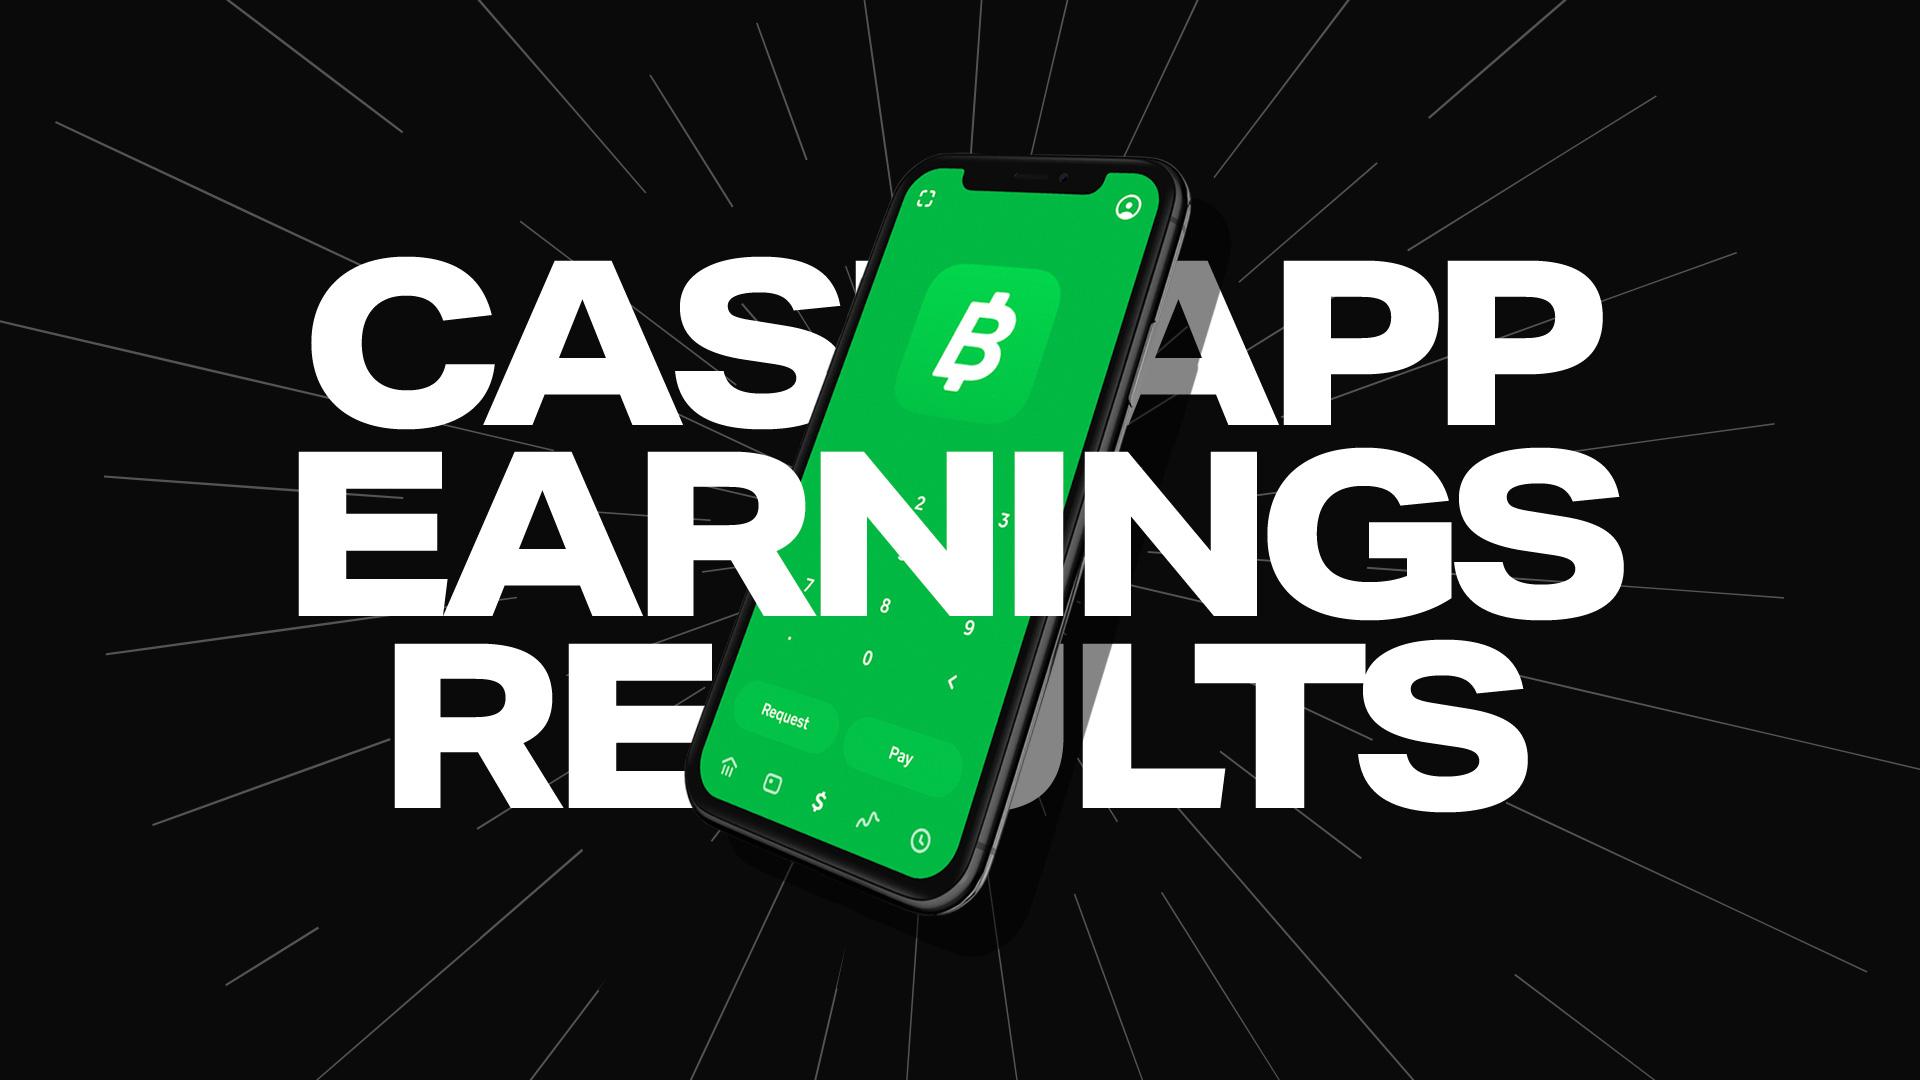 Square reports $3.51 billion in bitcoin revenue via its Cash app for first quarter of 2021